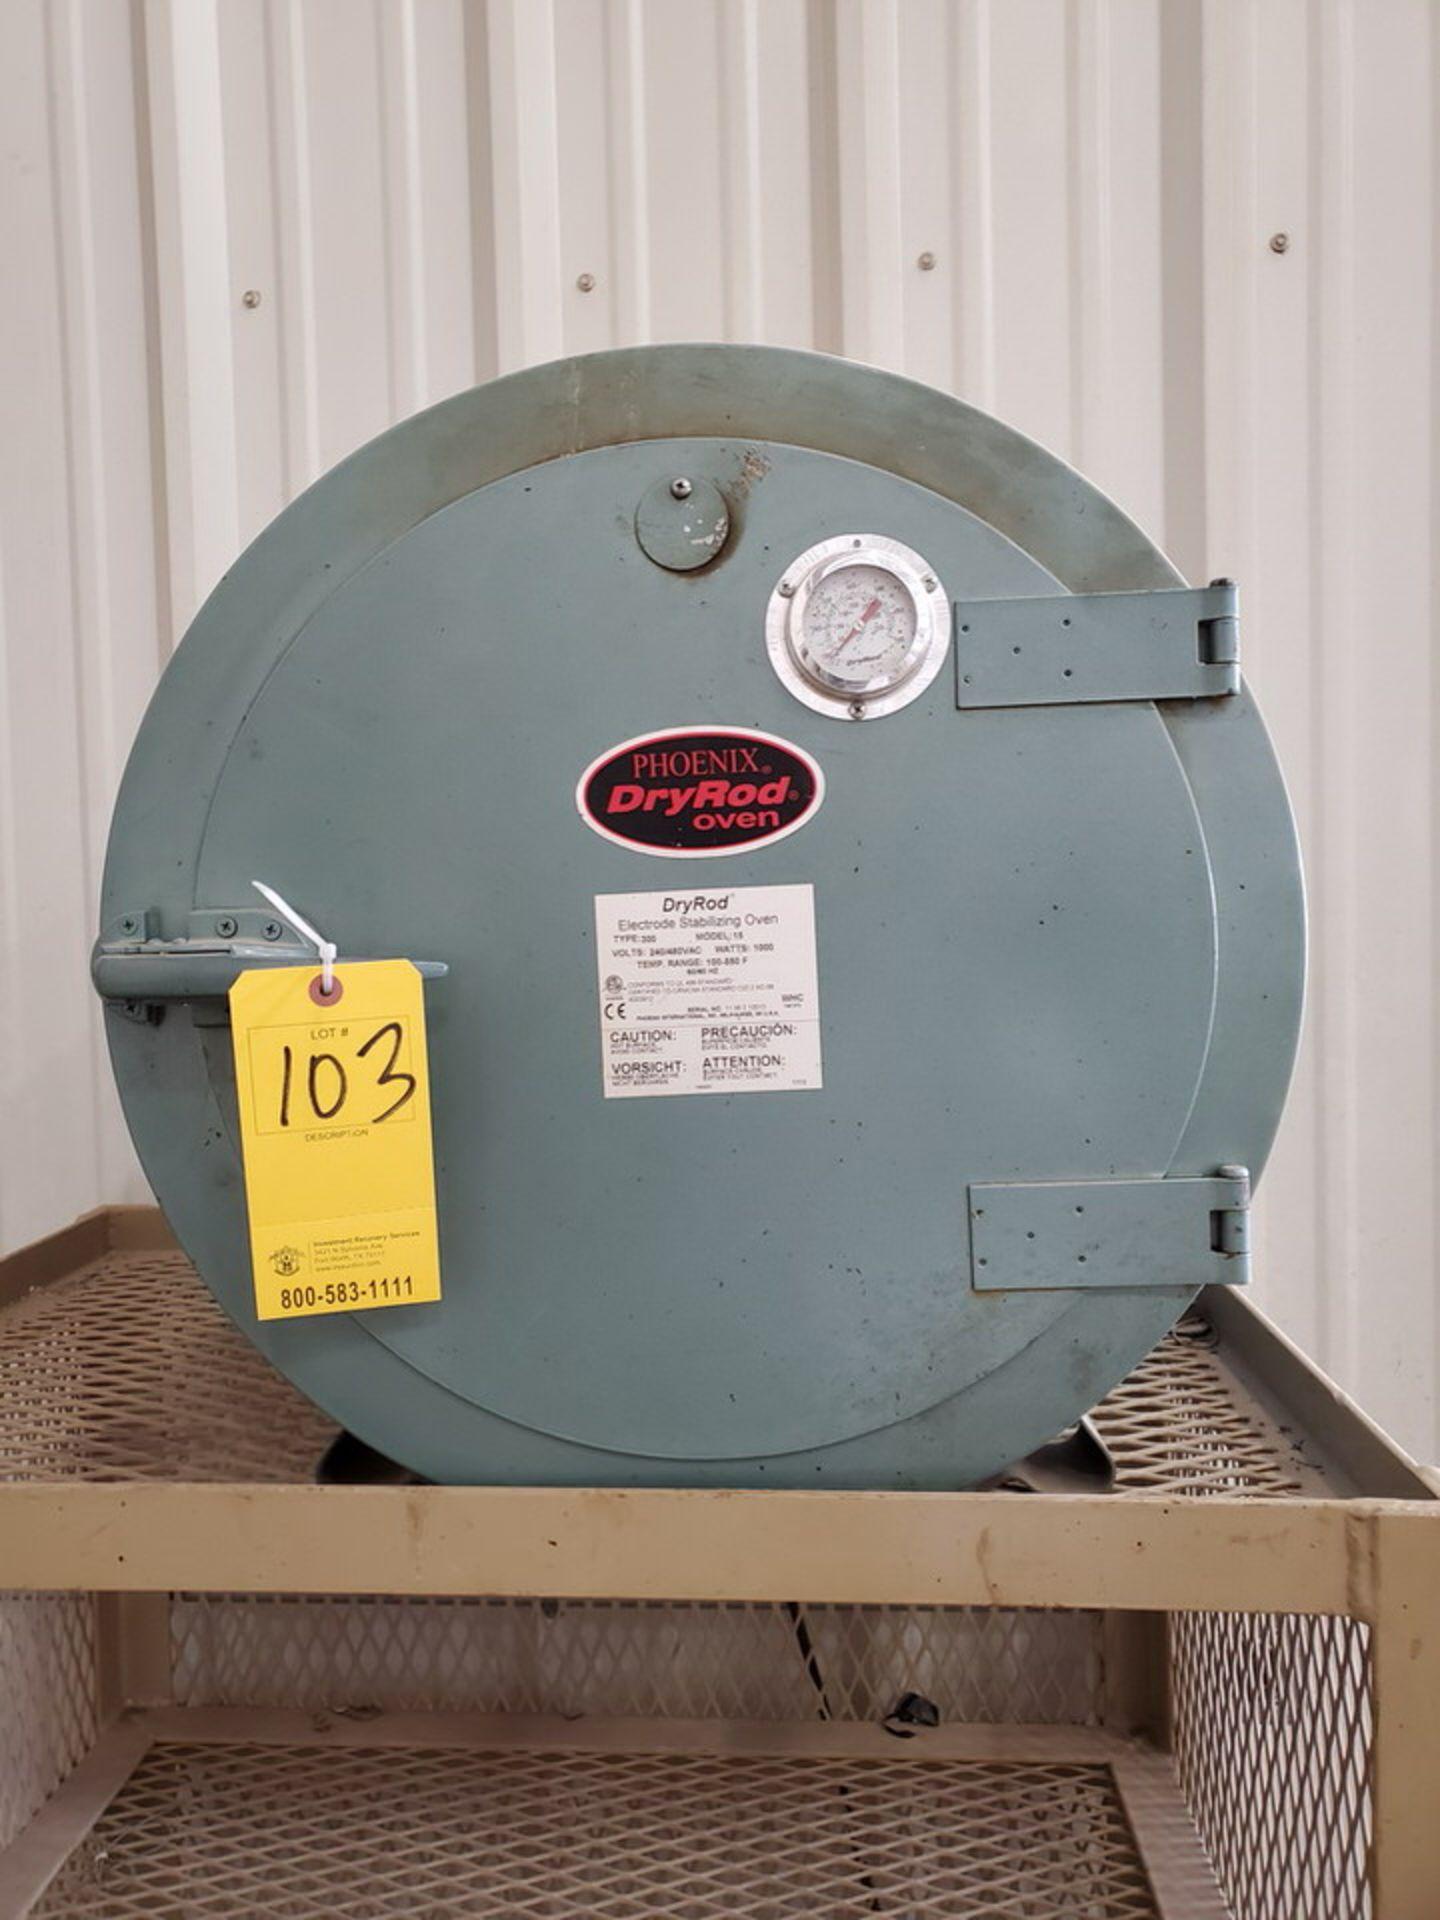 Phoenix 15 Dry Rod Oven 240/480V, 1,000W, 50/60HZ, Temp Range: 100-550F - Image 2 of 4